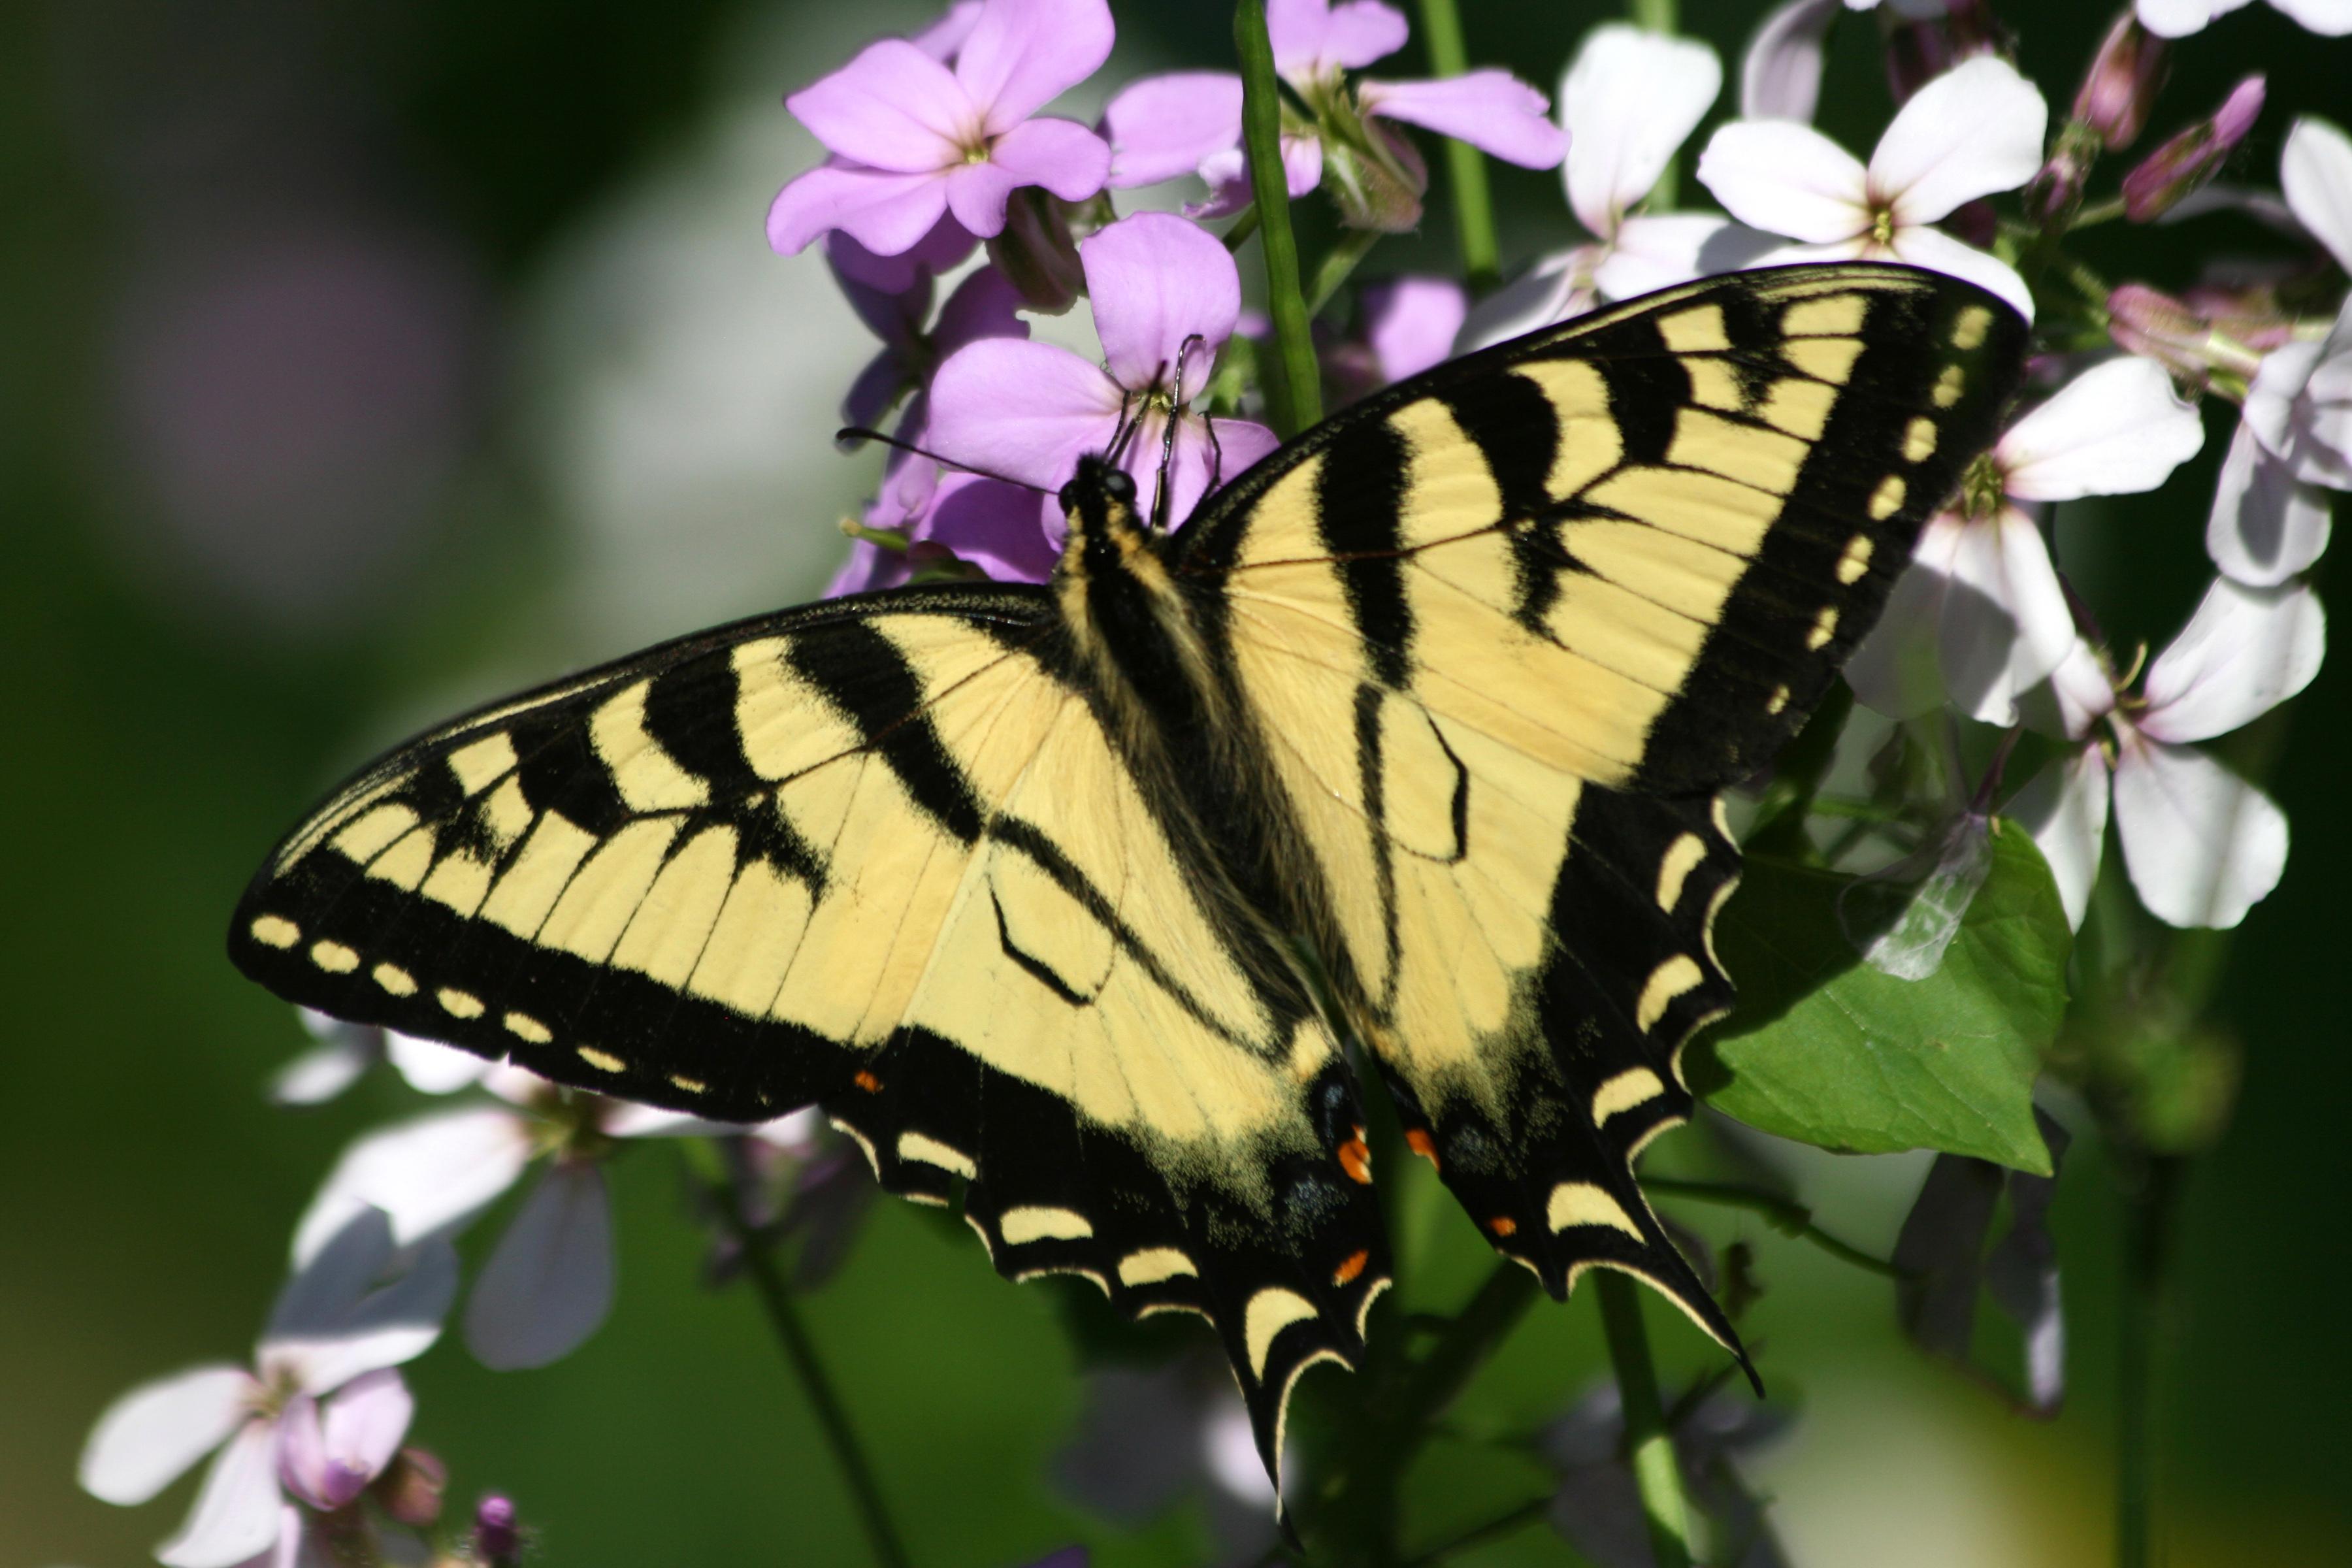 eastern tiger swallowtail butterflies